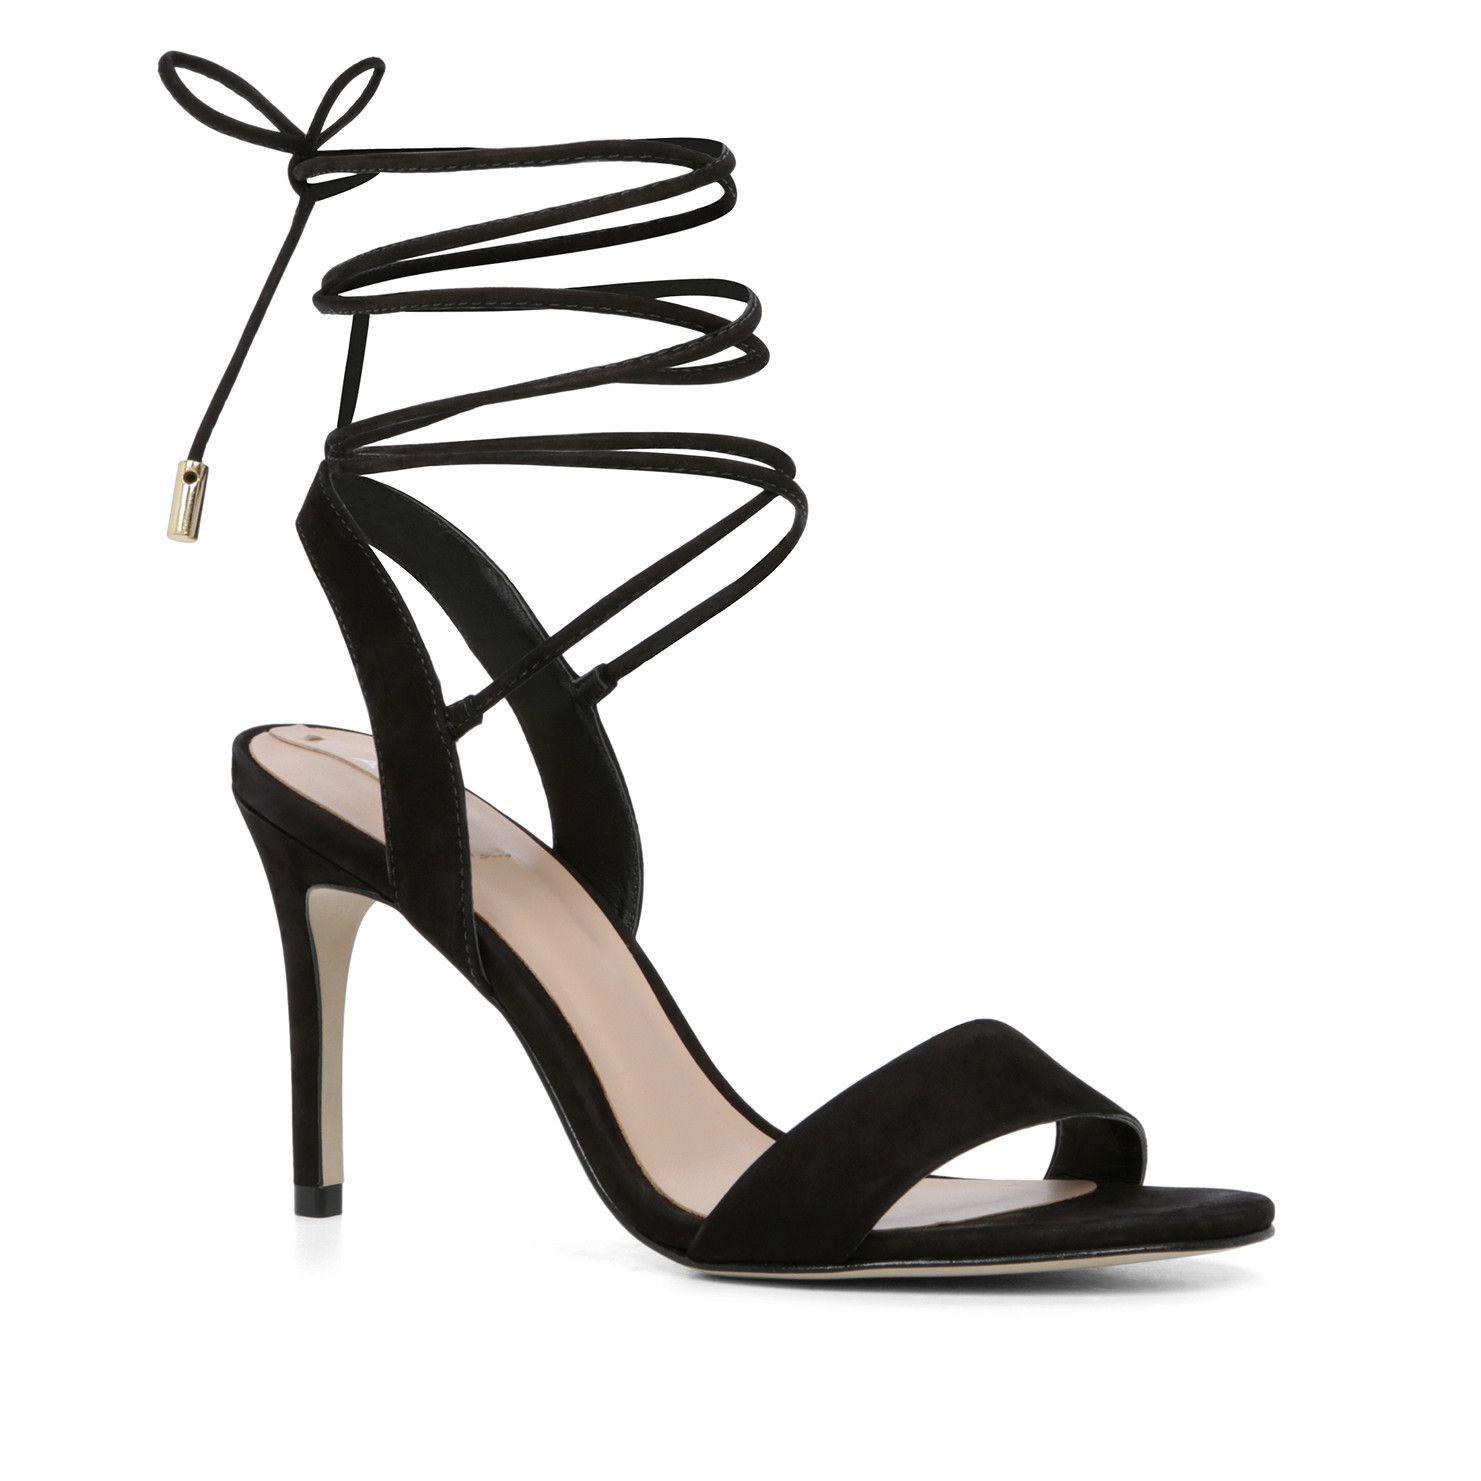 Buty Aldo Kolekcja Ss2016 Sandals Aldo Sandals High